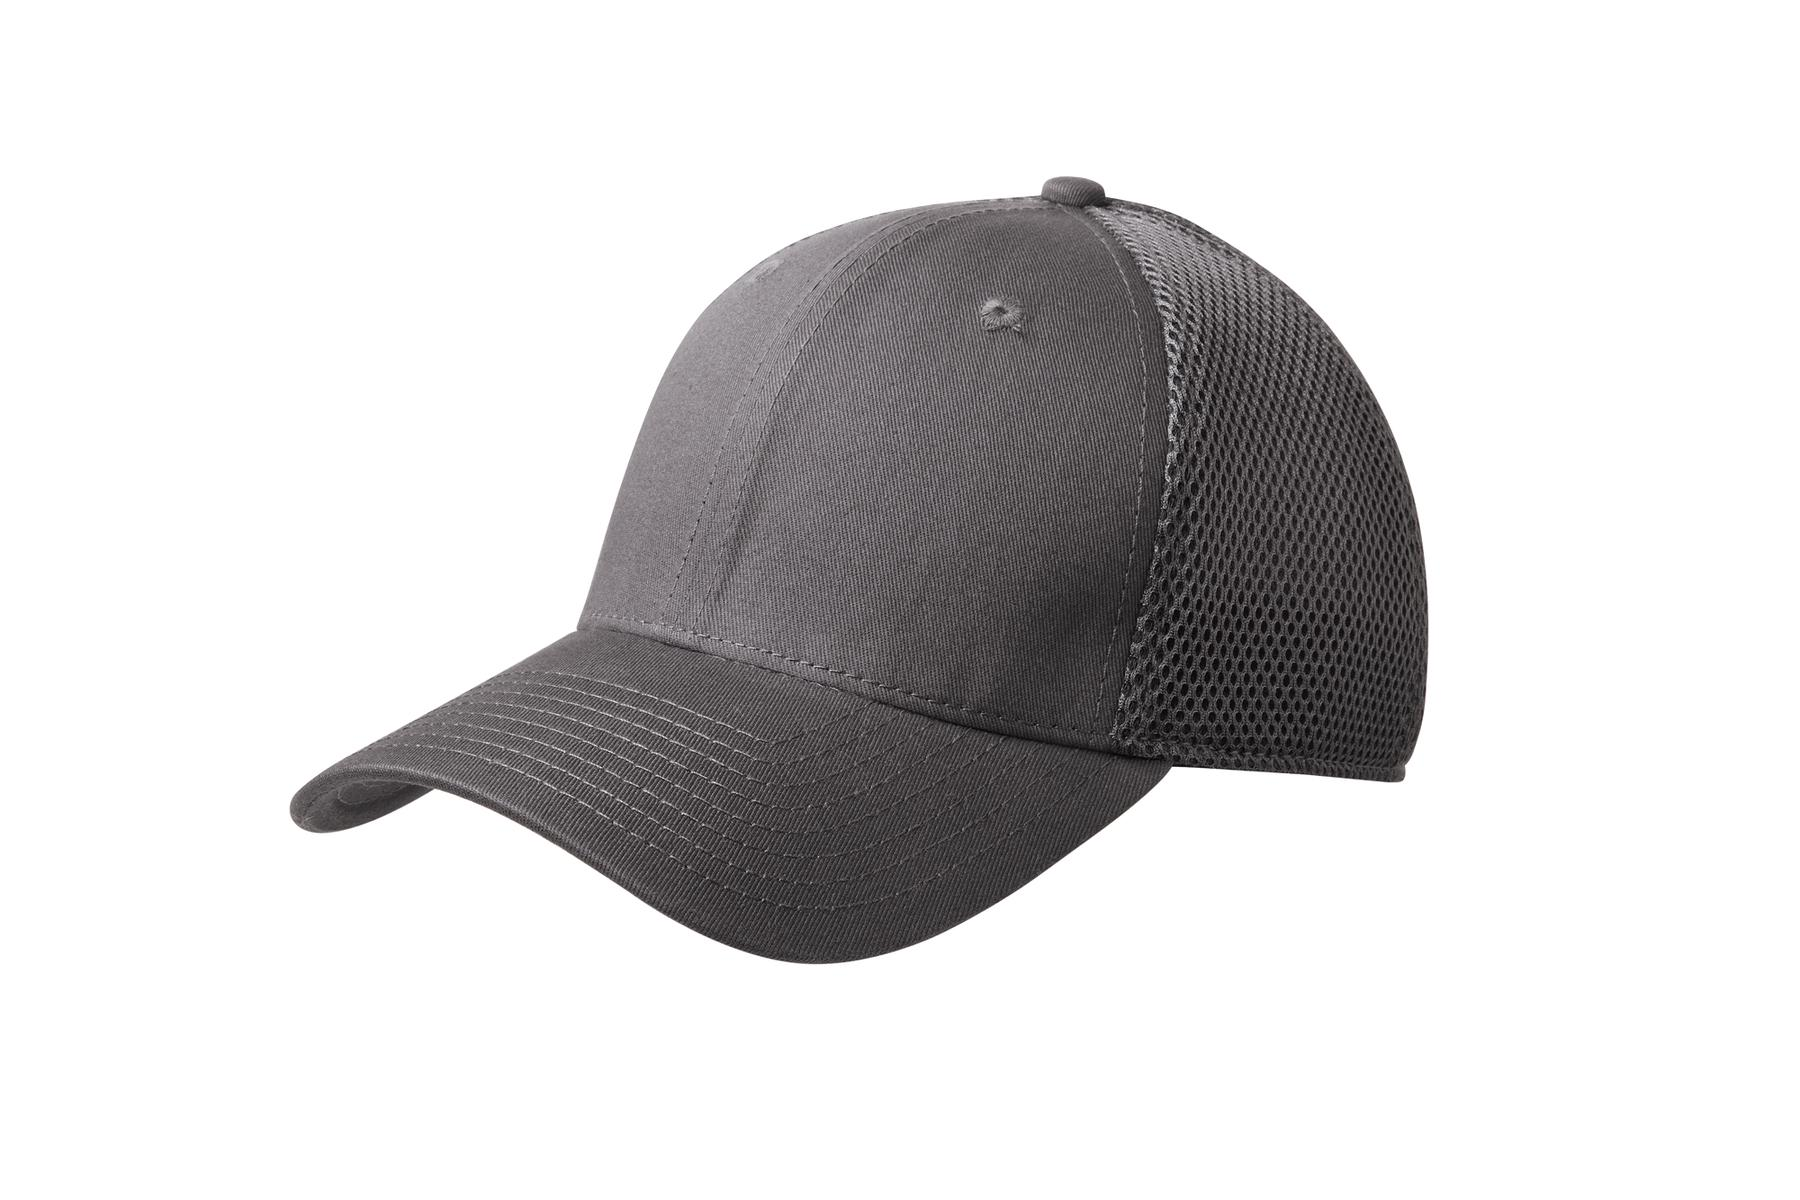 New Era Stretch Mesh Cap – UK – Kentucky Uniforms 4e9ba01cb6c